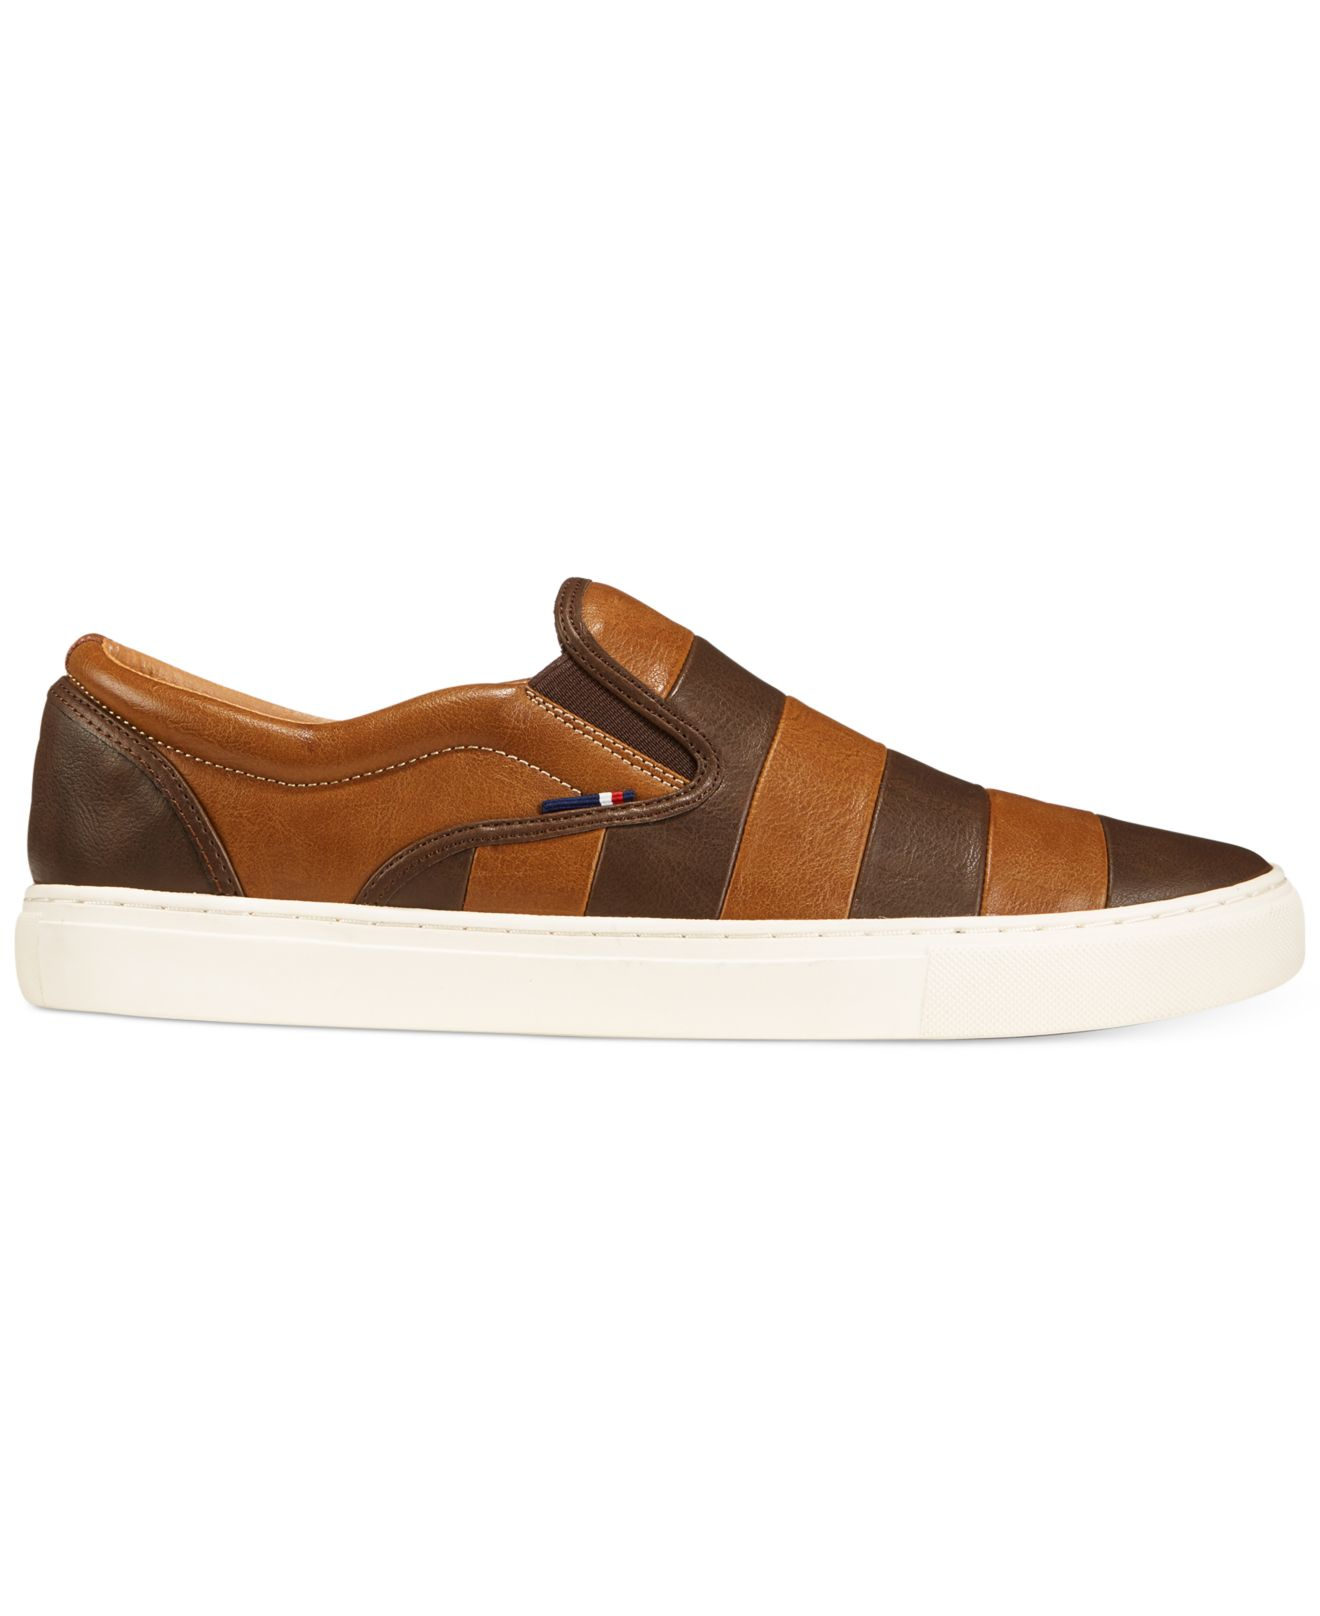 tommy hilfiger mustang 2 slip on sneakers in brown for men lyst. Black Bedroom Furniture Sets. Home Design Ideas